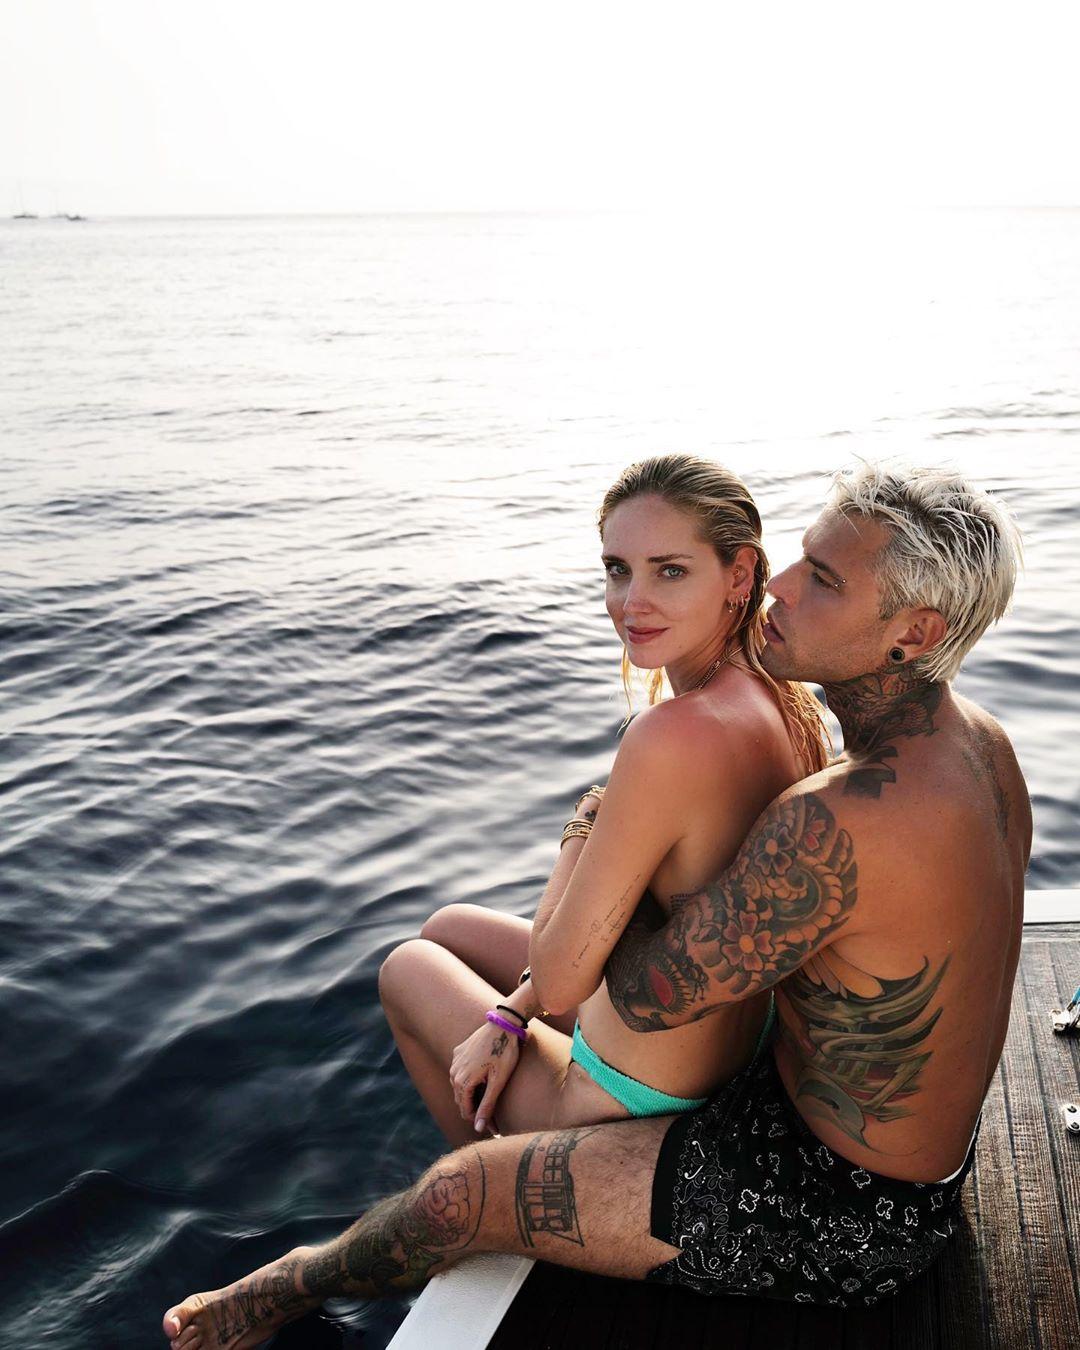 Chiara Ferragni: Οι topless φωτογραφίες που βάζουν «φωτιά» στο Instagram!